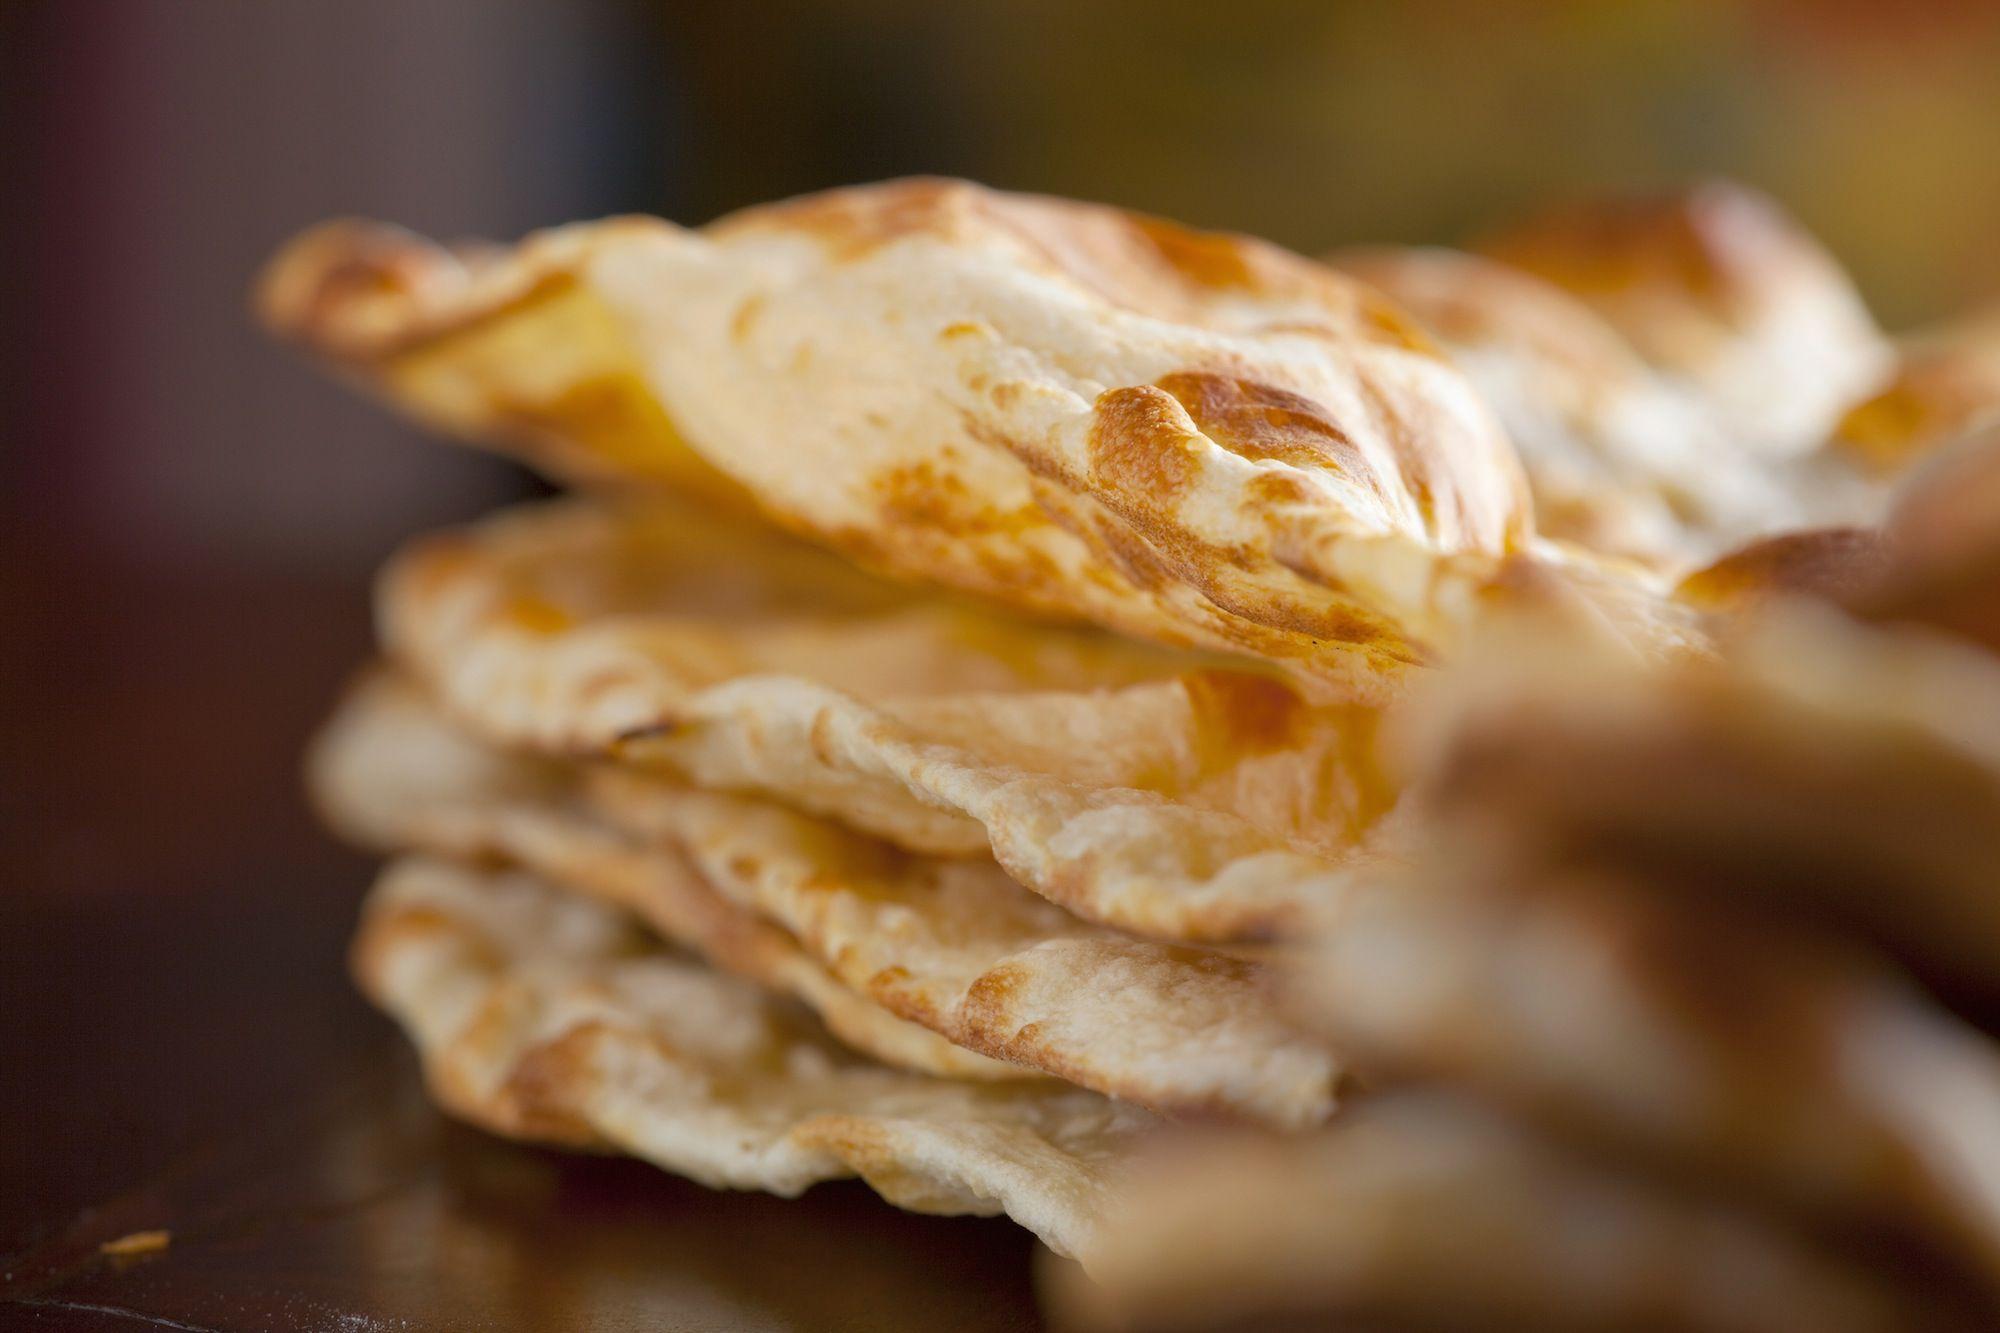 Naan Recipe For Leavened Indian Flatbread